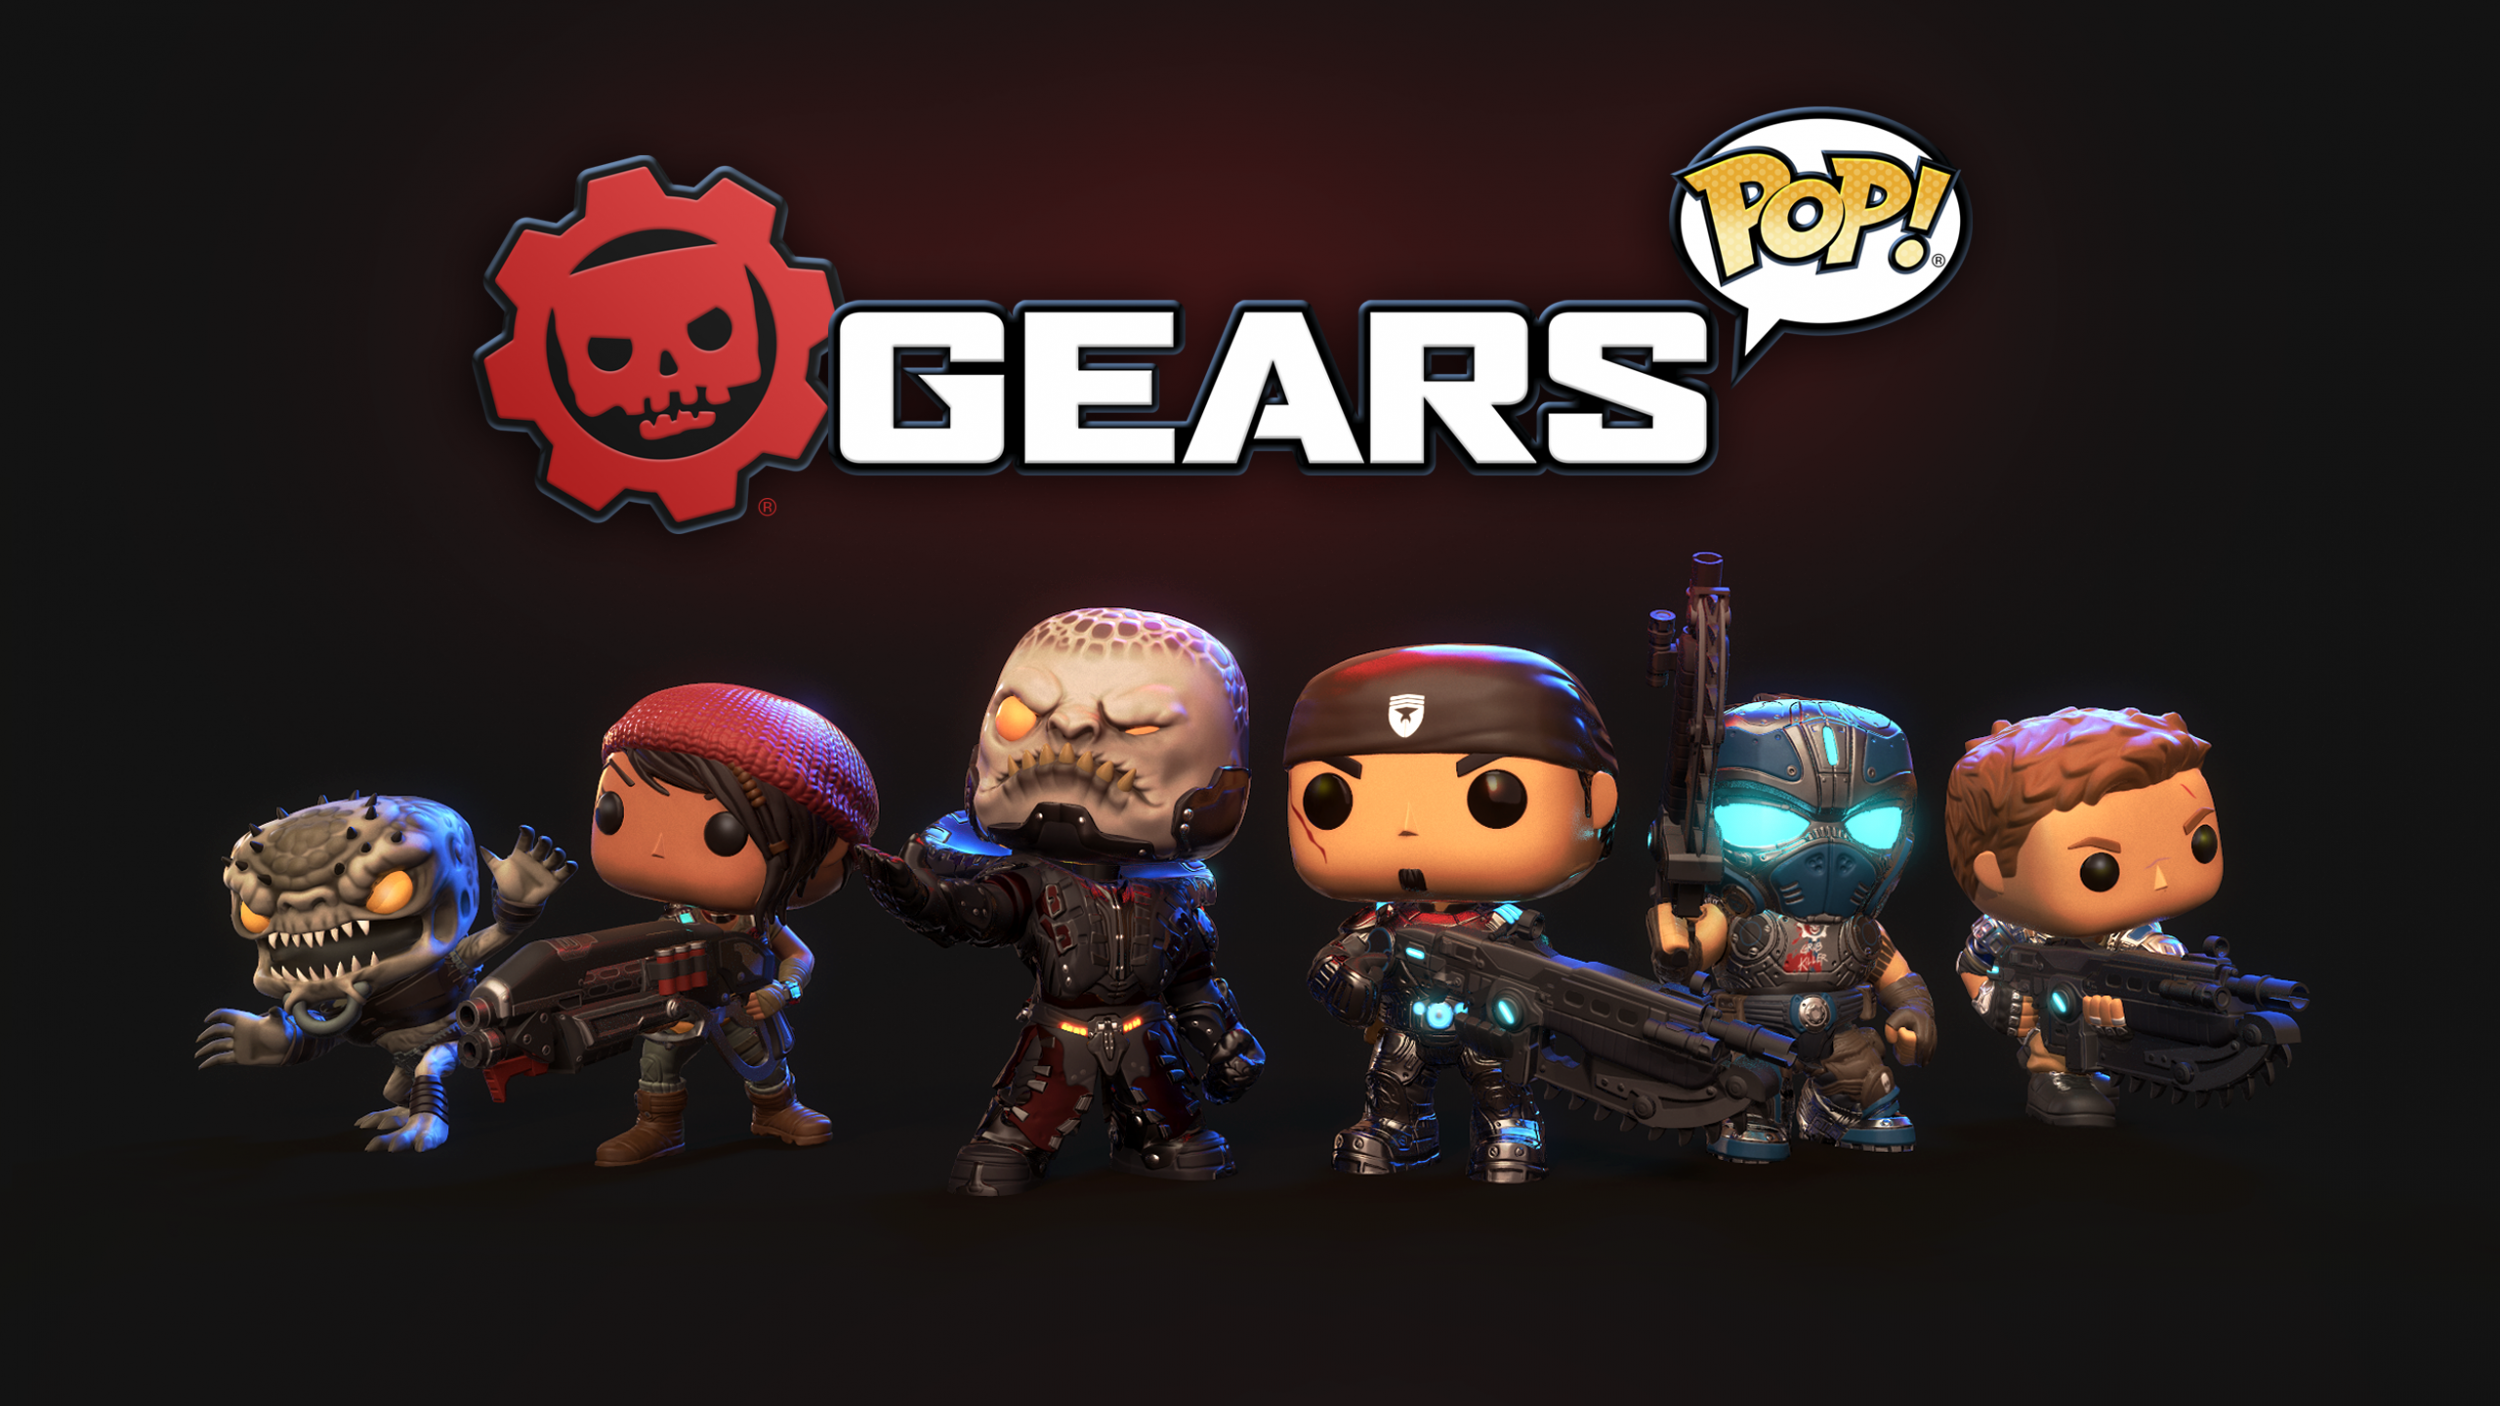 Gears-Pop_Full-Lineup